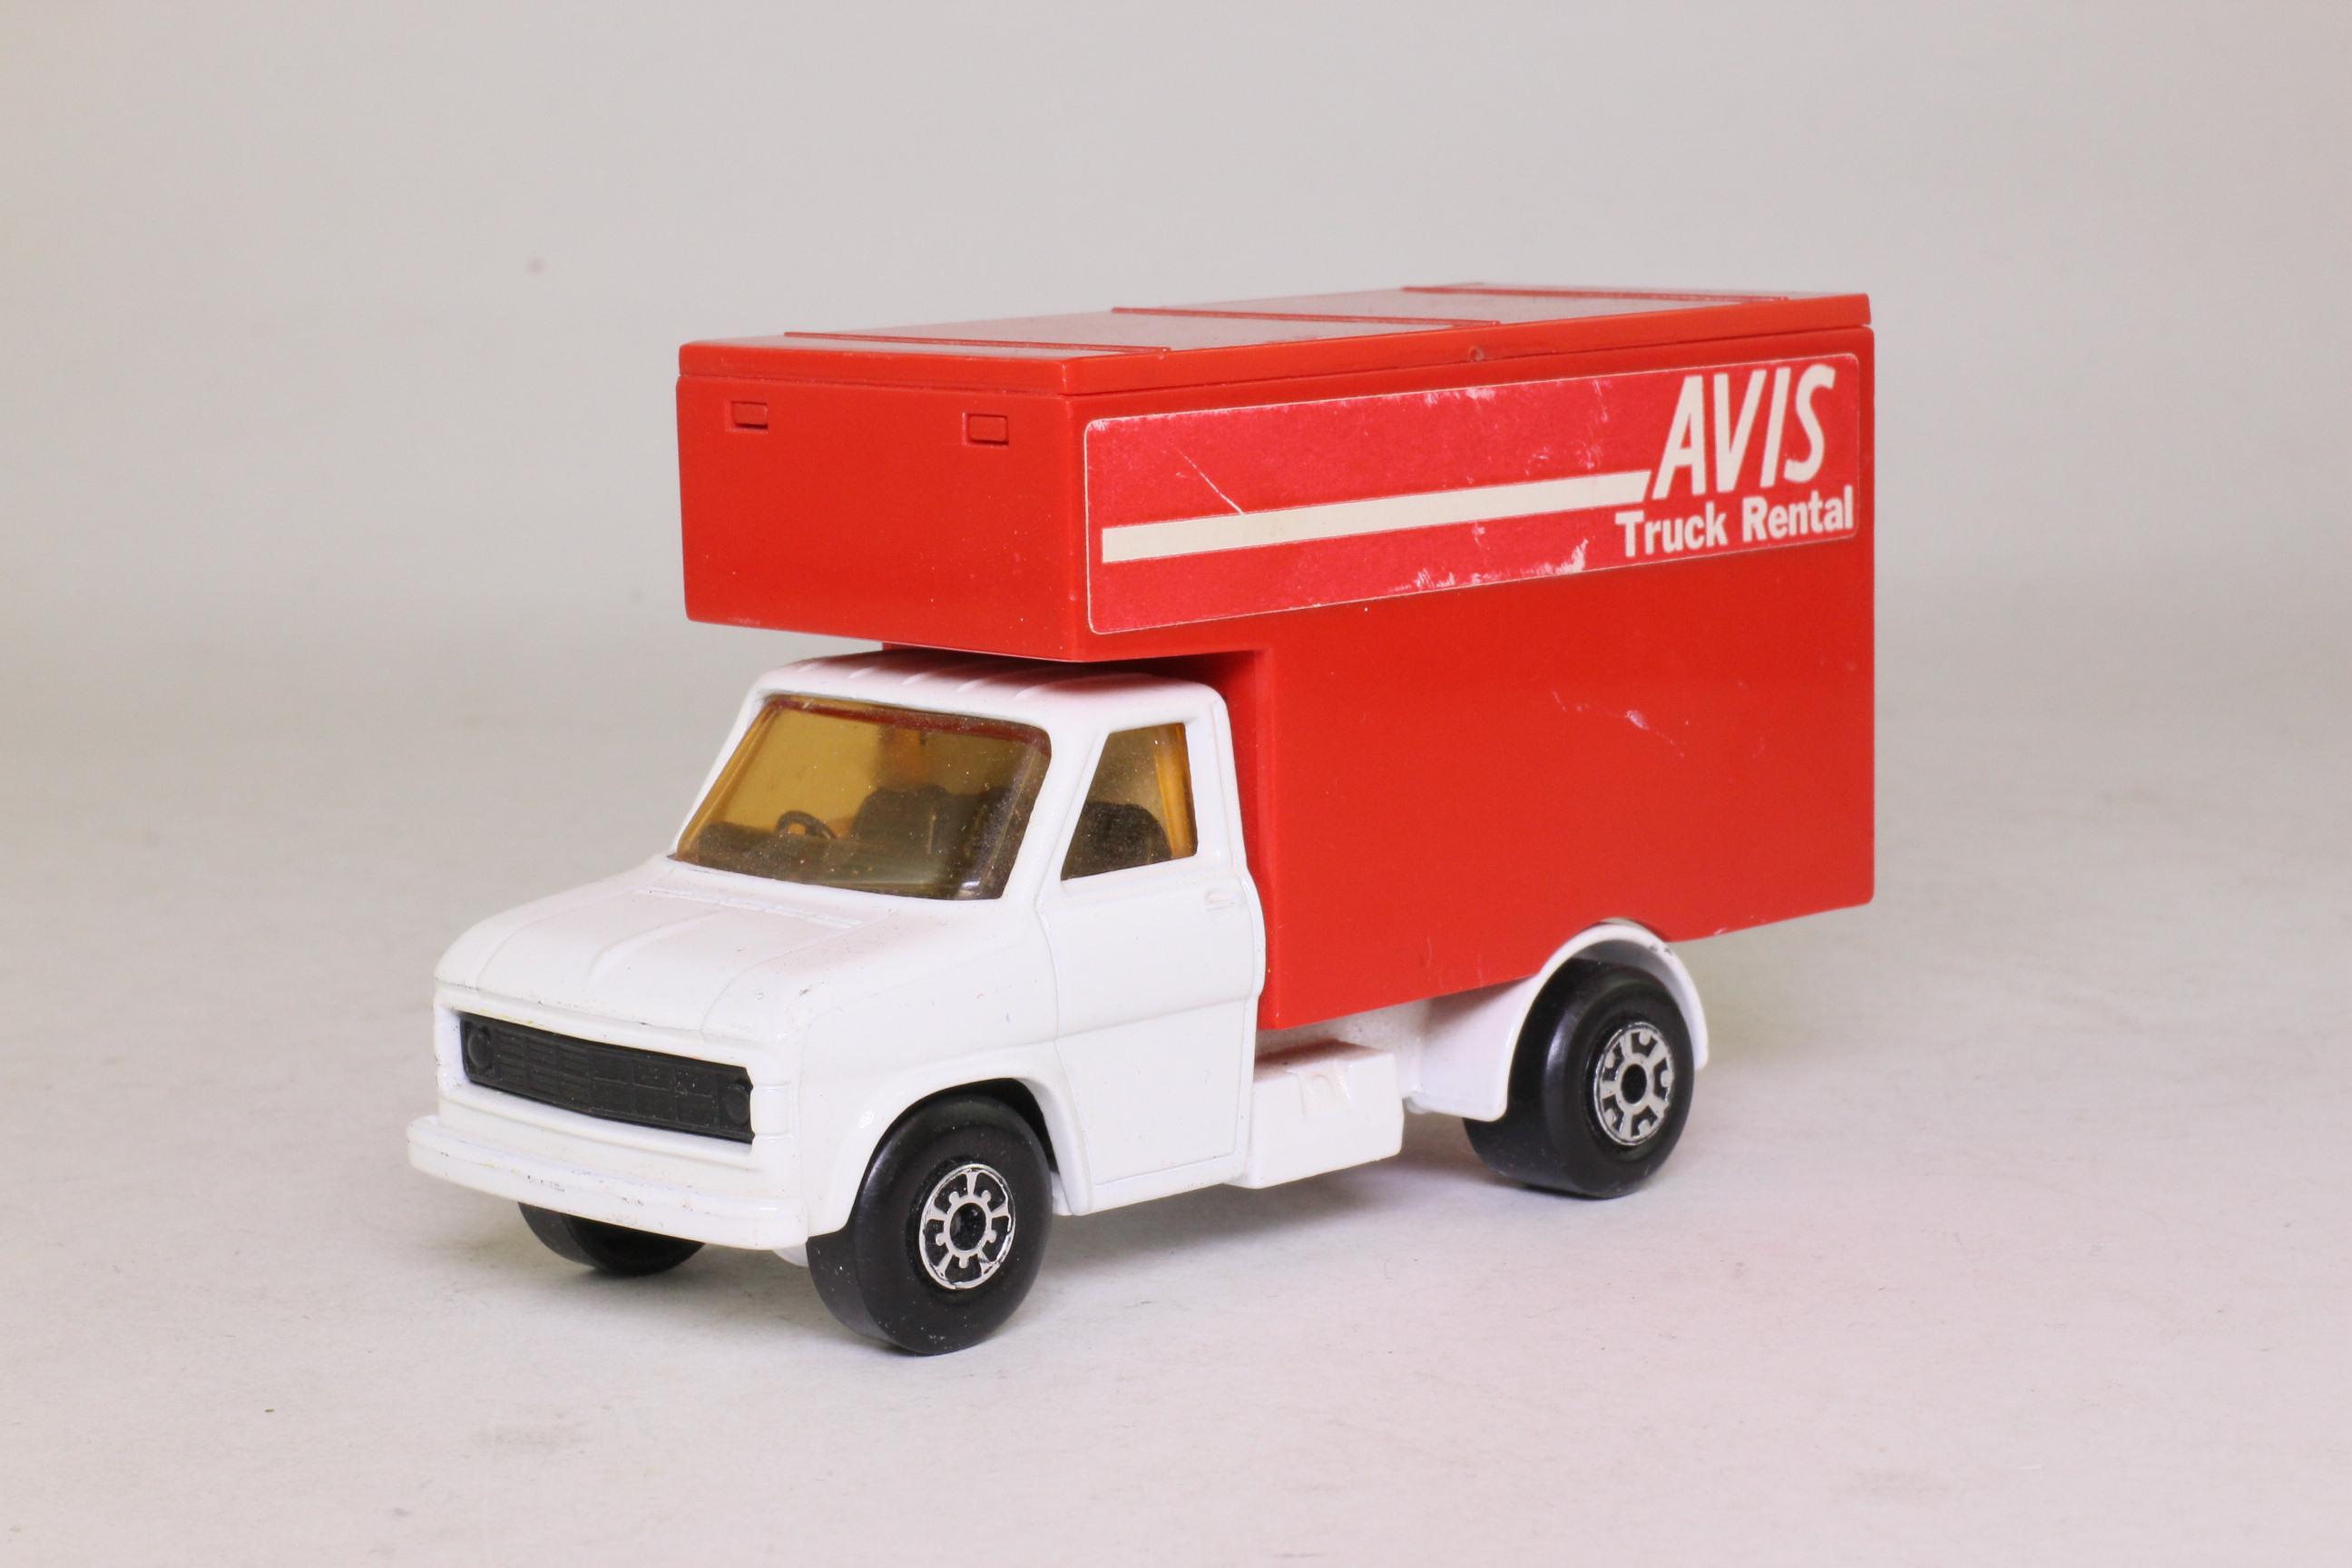 Matchbox King Size K-29/2; Ford A Series Luton Van; Avis Truck Rental, Very Rare White Cab 80312